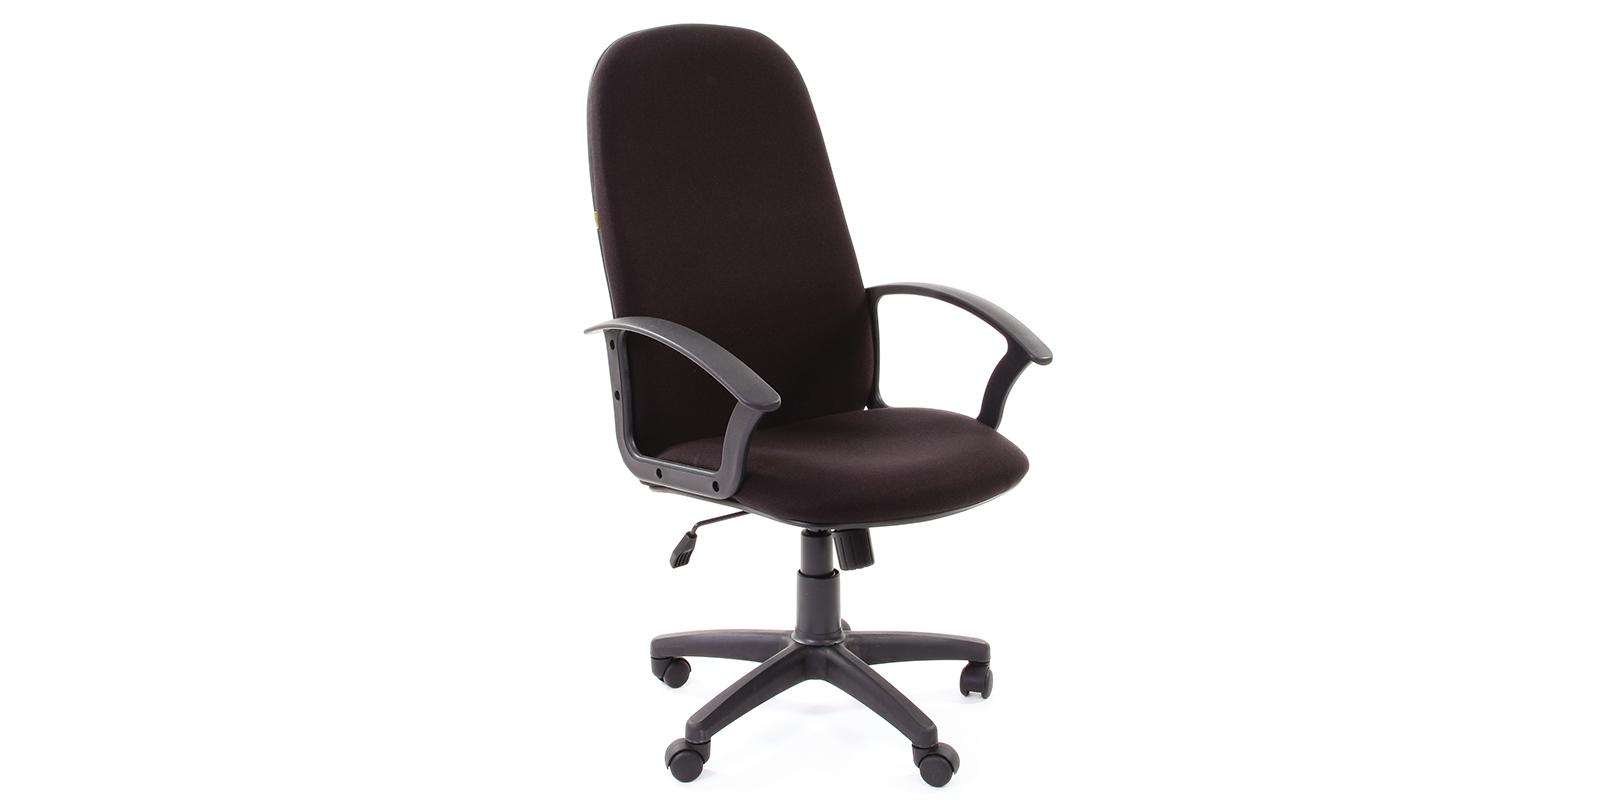 Игровое кресло HomeMe Chairman 289 от Homeme.ru